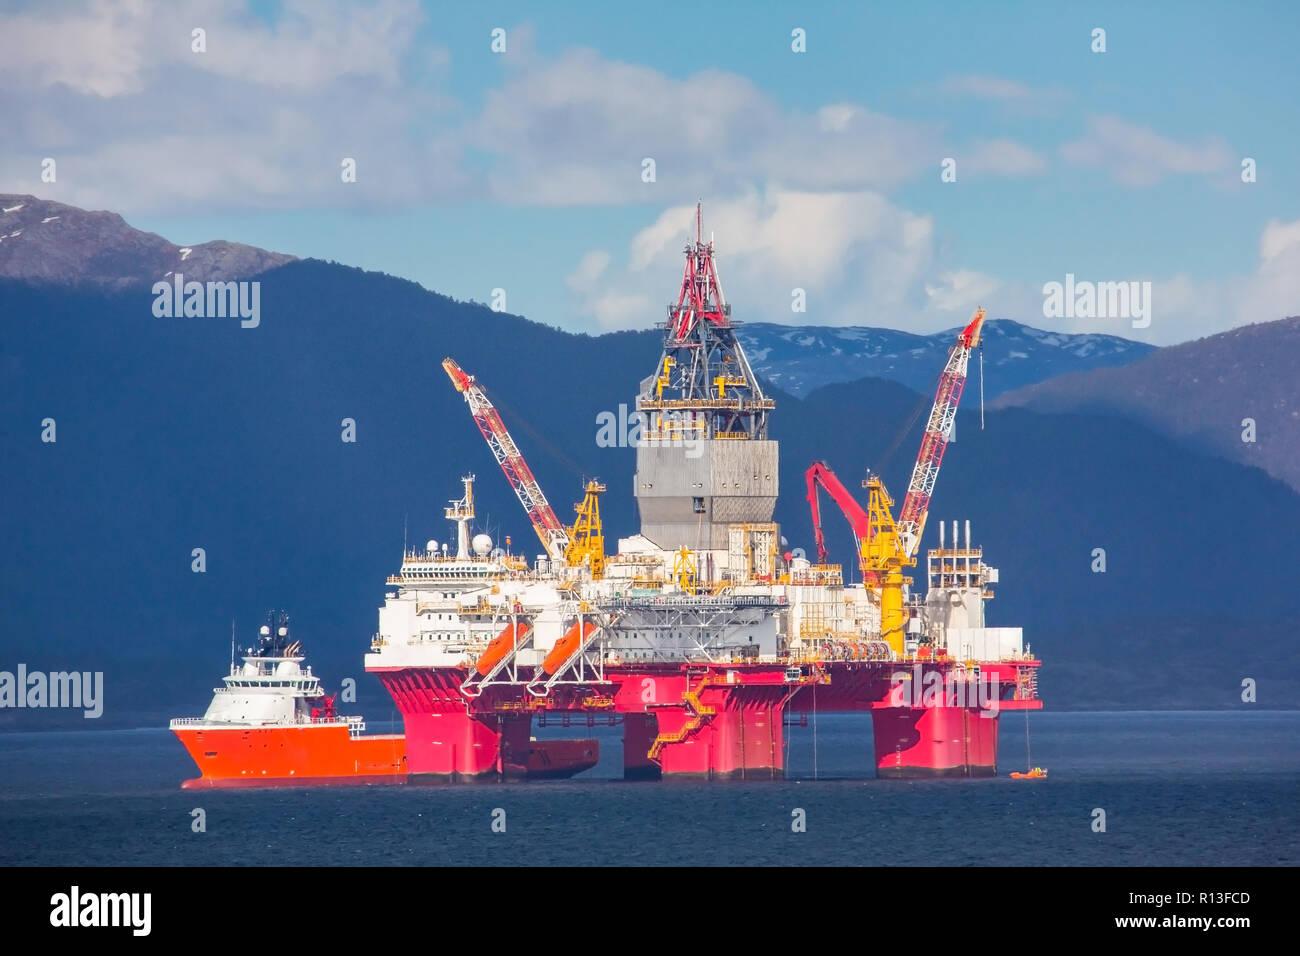 Oil rig near Bergen, Norway. Stock Photo